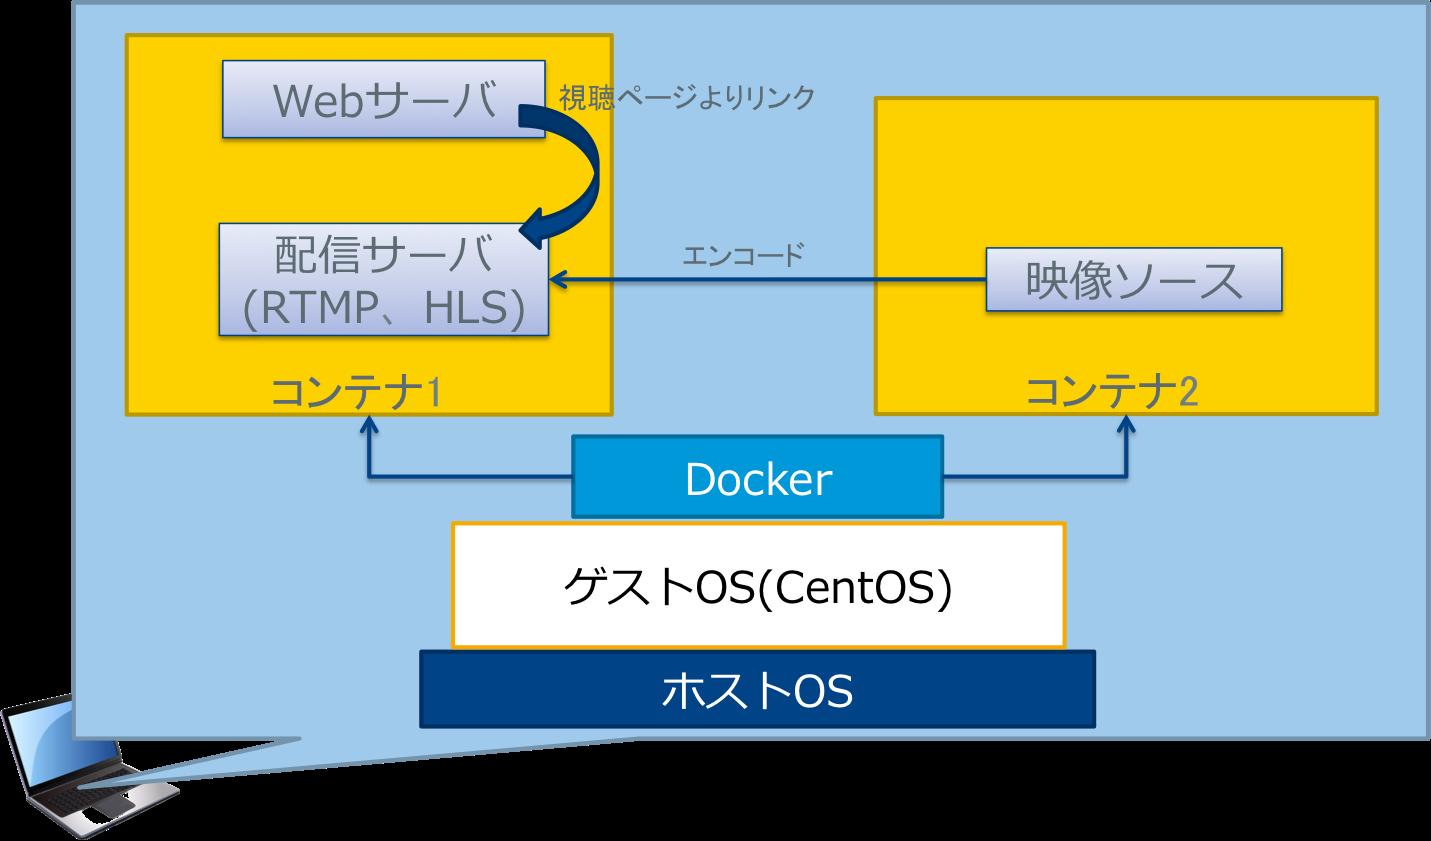 Nginxとffmpegで映像プレイヤーの検証環境を構築(RTMP、HLS